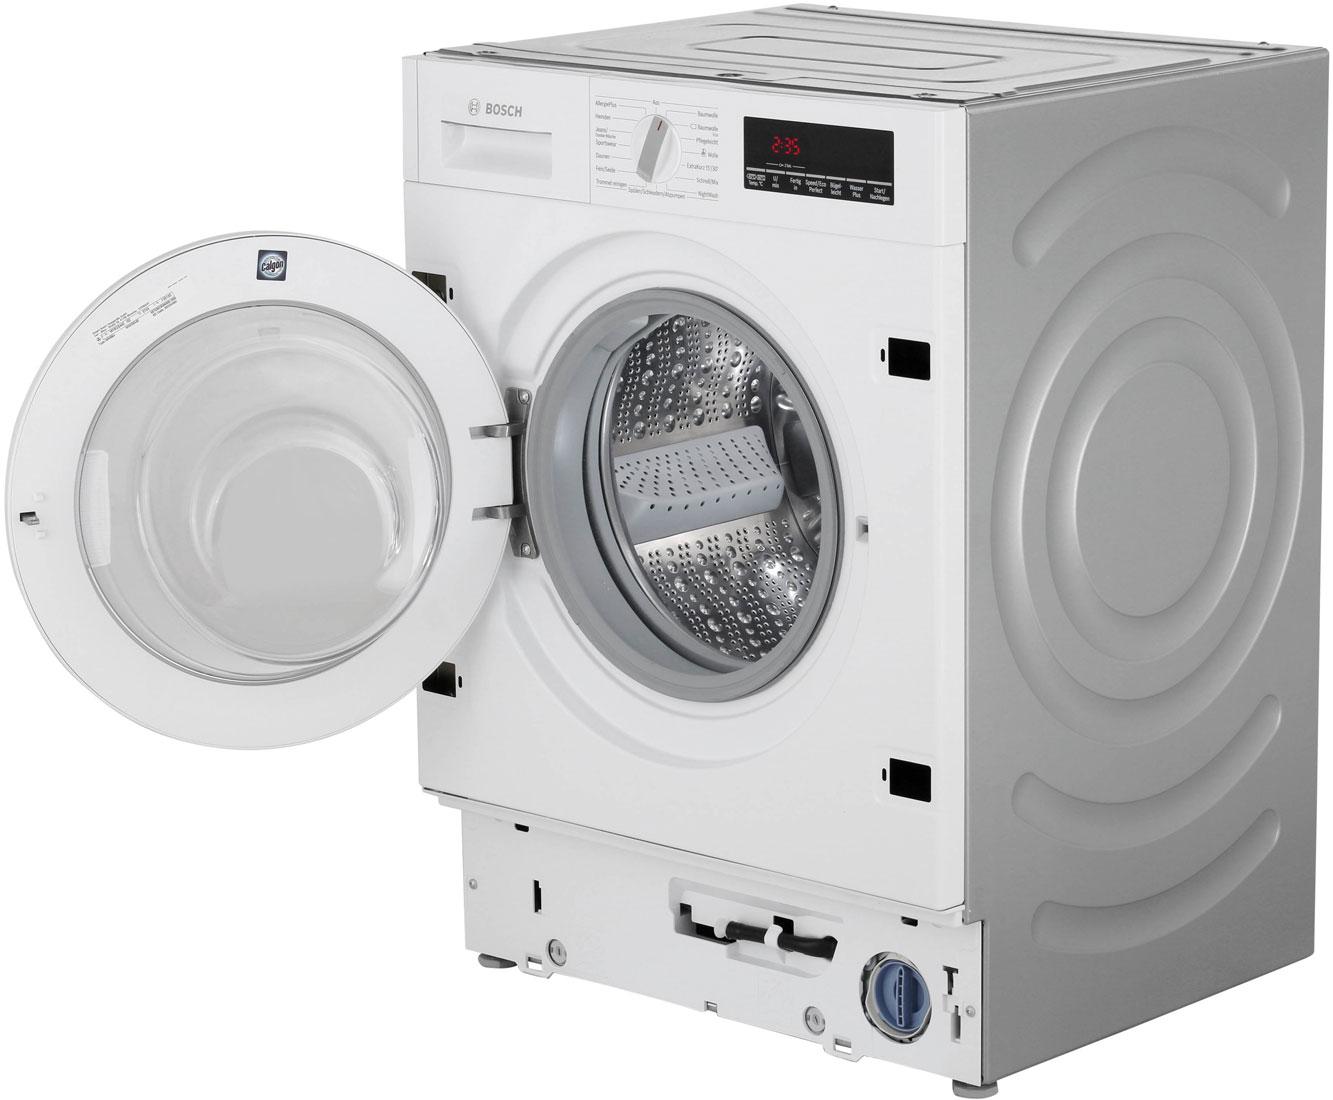 Bosch waschmaschine symbole bedeutung carterdigital club